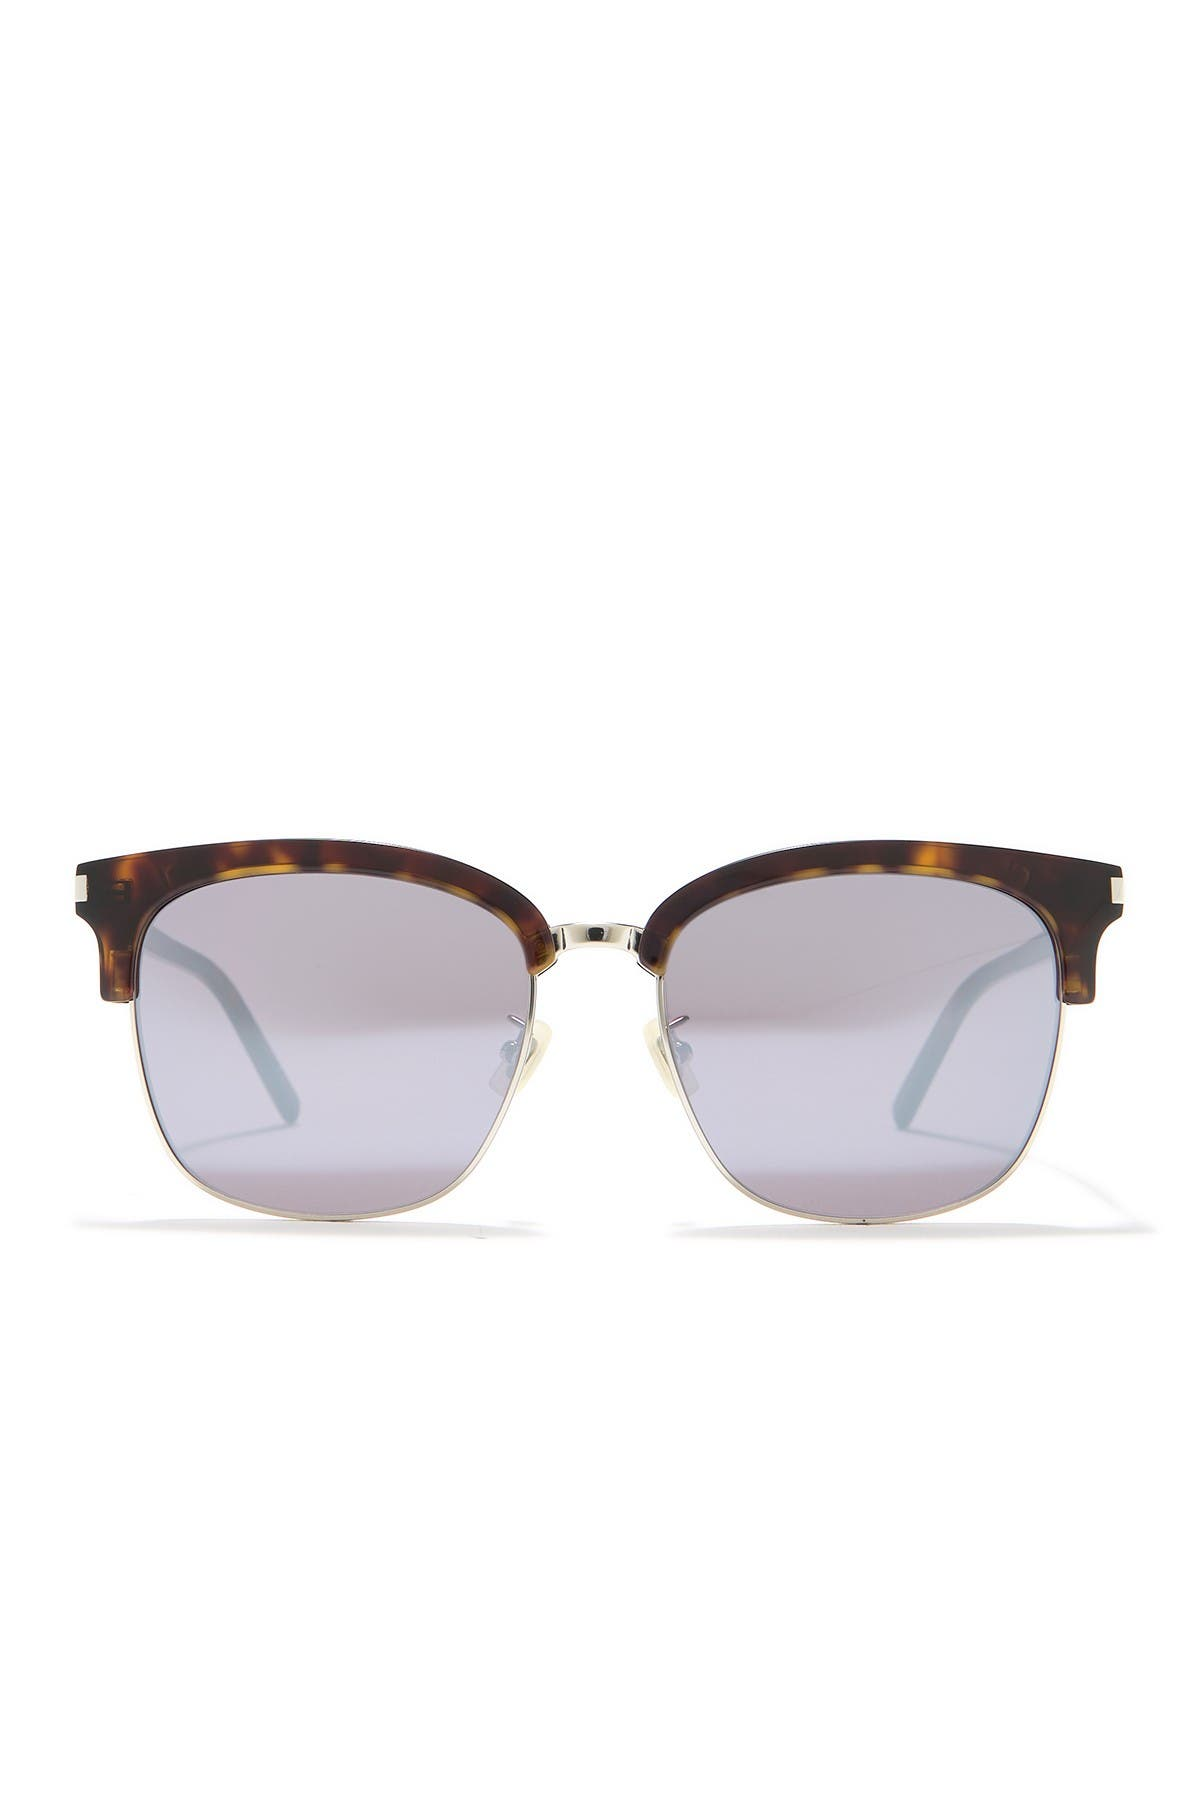 Image of Saint Laurent Core 56mm Sunglasses